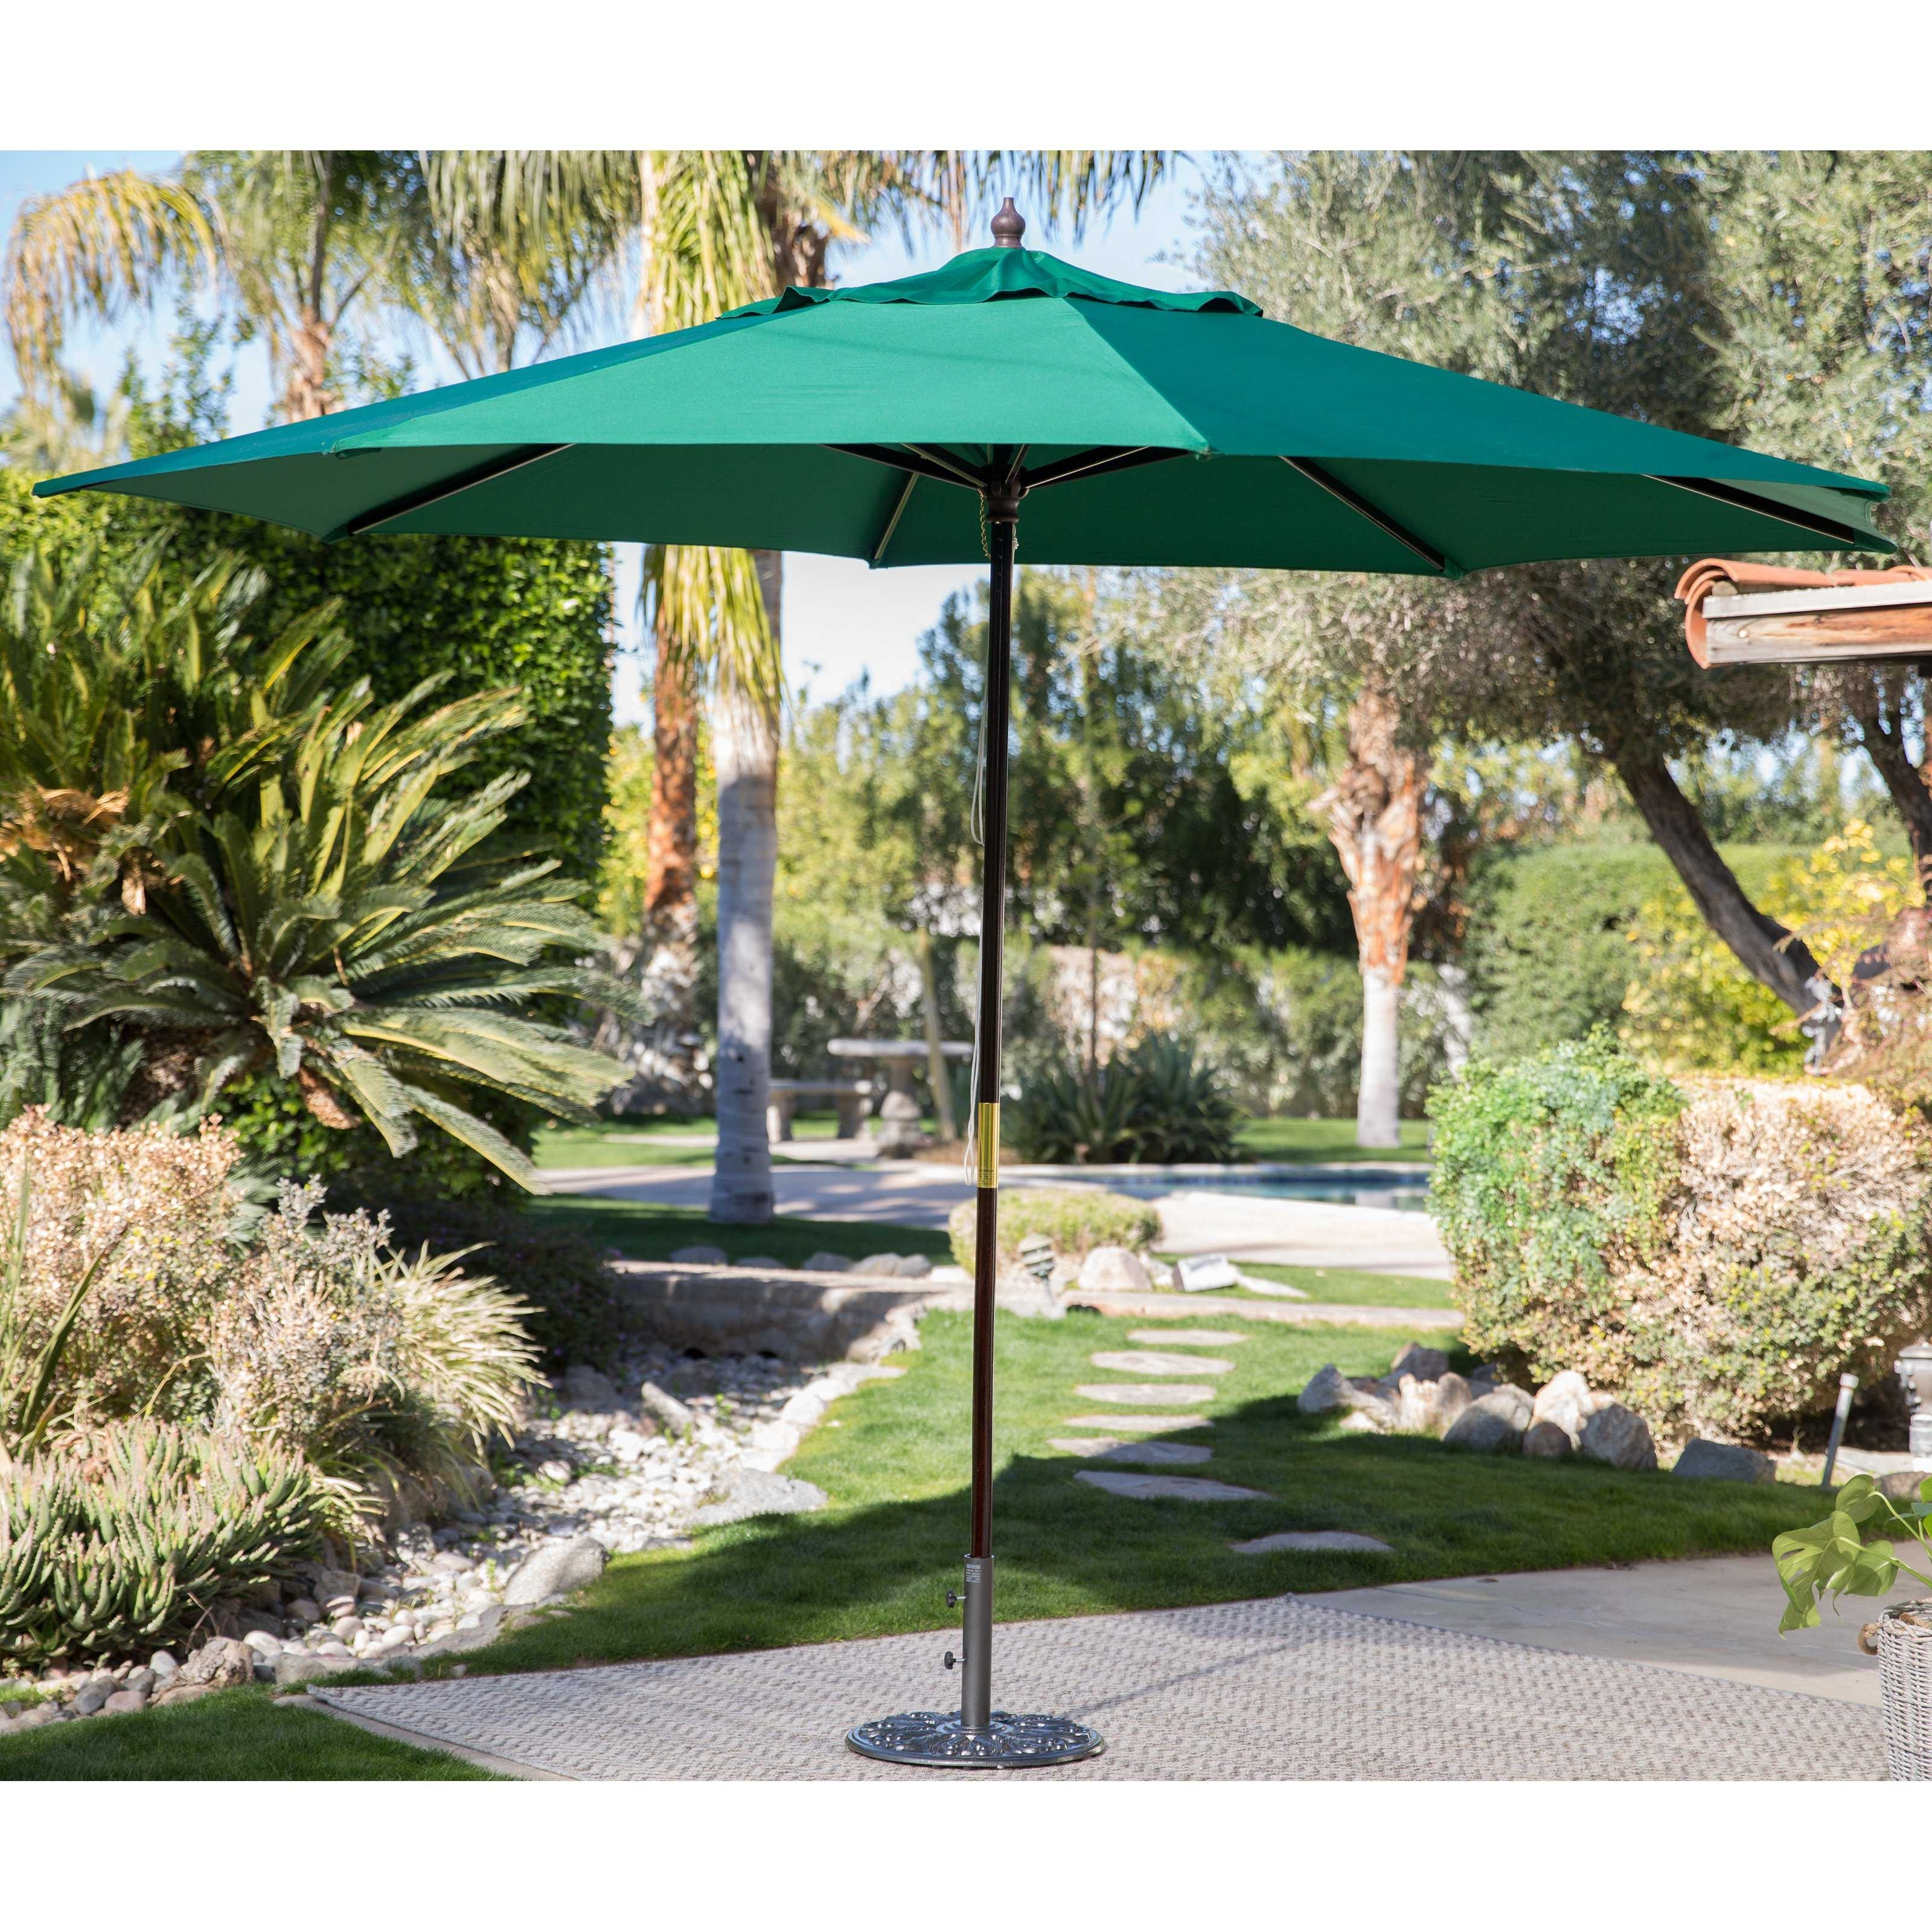 Trendy Cheap Patio Umbrellas For Cheap Patio Umbrellas – Interperform (View 19 of 20)